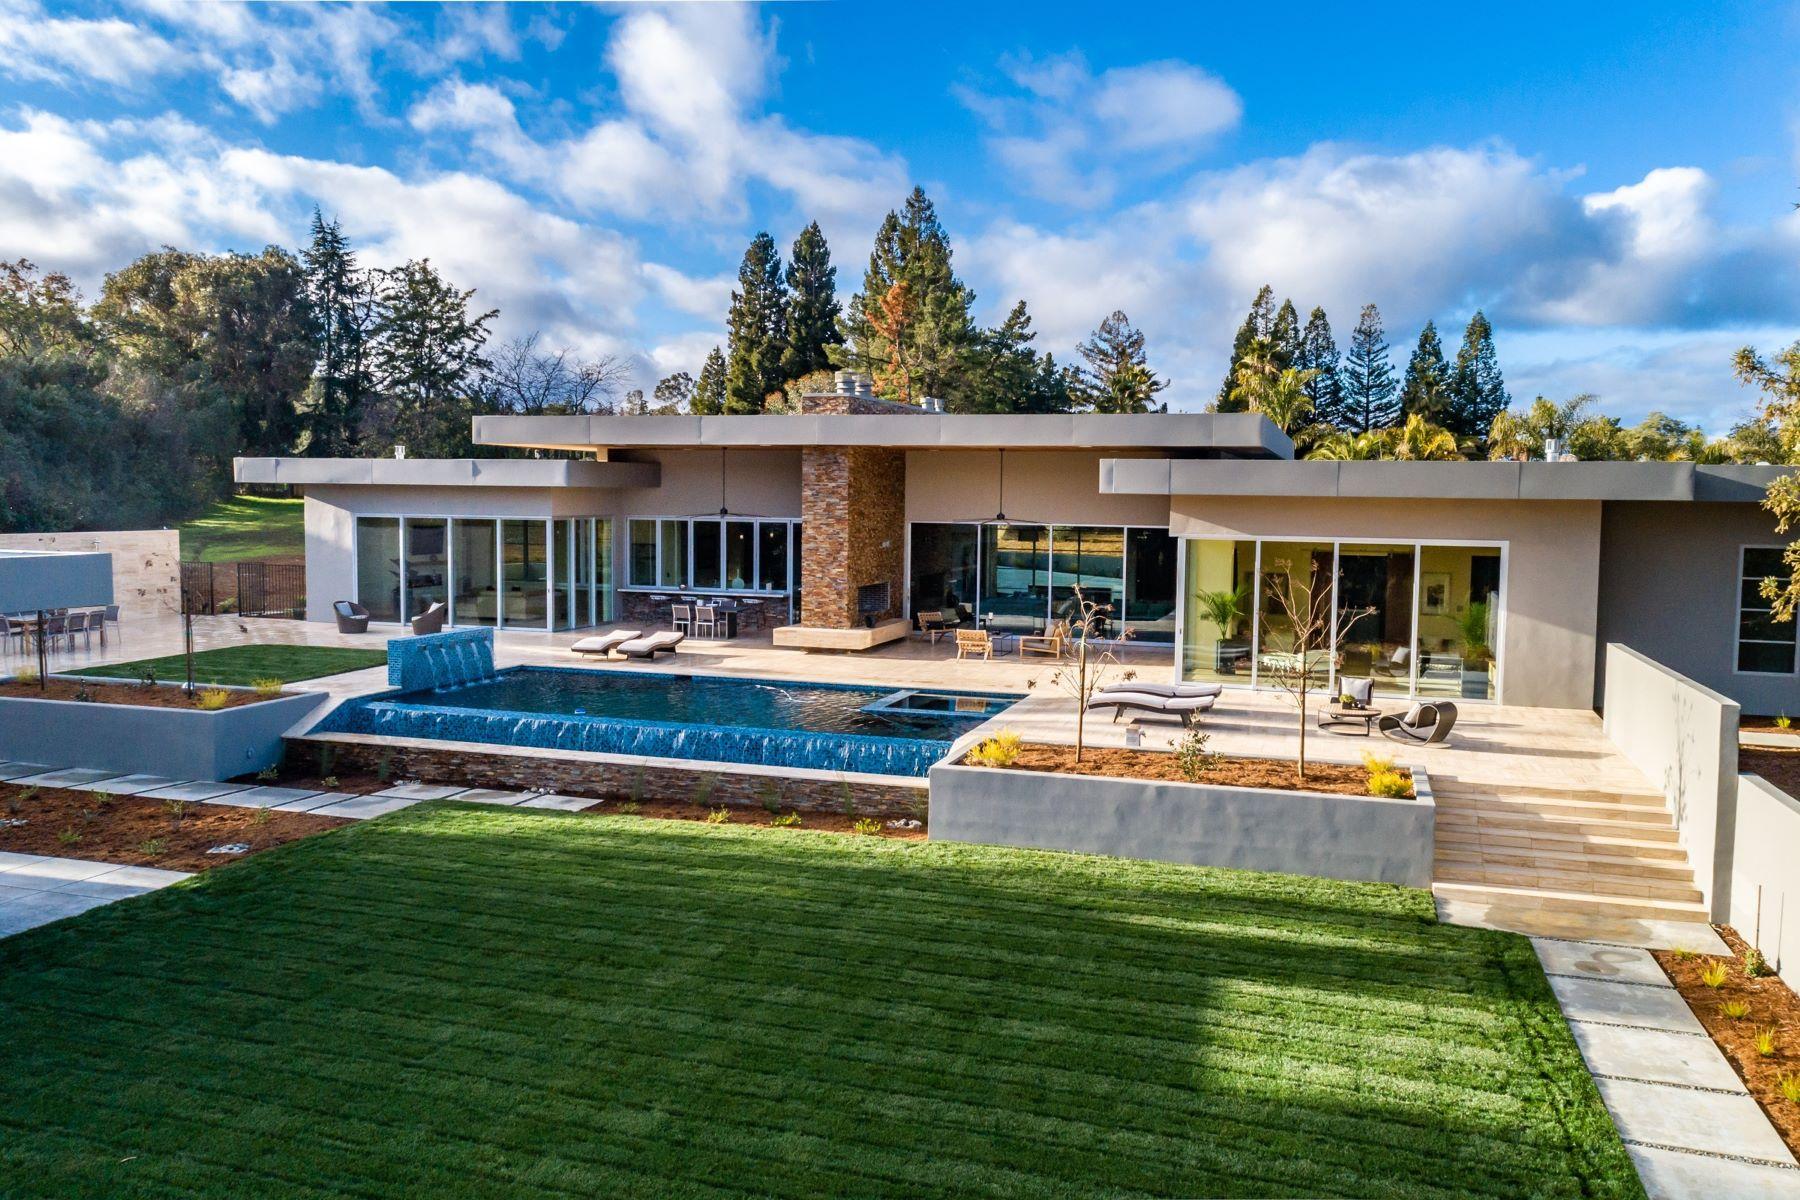 Single Family Homes para Venda às Just Completed with Inspiration from Mid-Century Modern Design 26270 Purissima Road, Los Altos Hills, Califórnia 94022 Estados Unidos